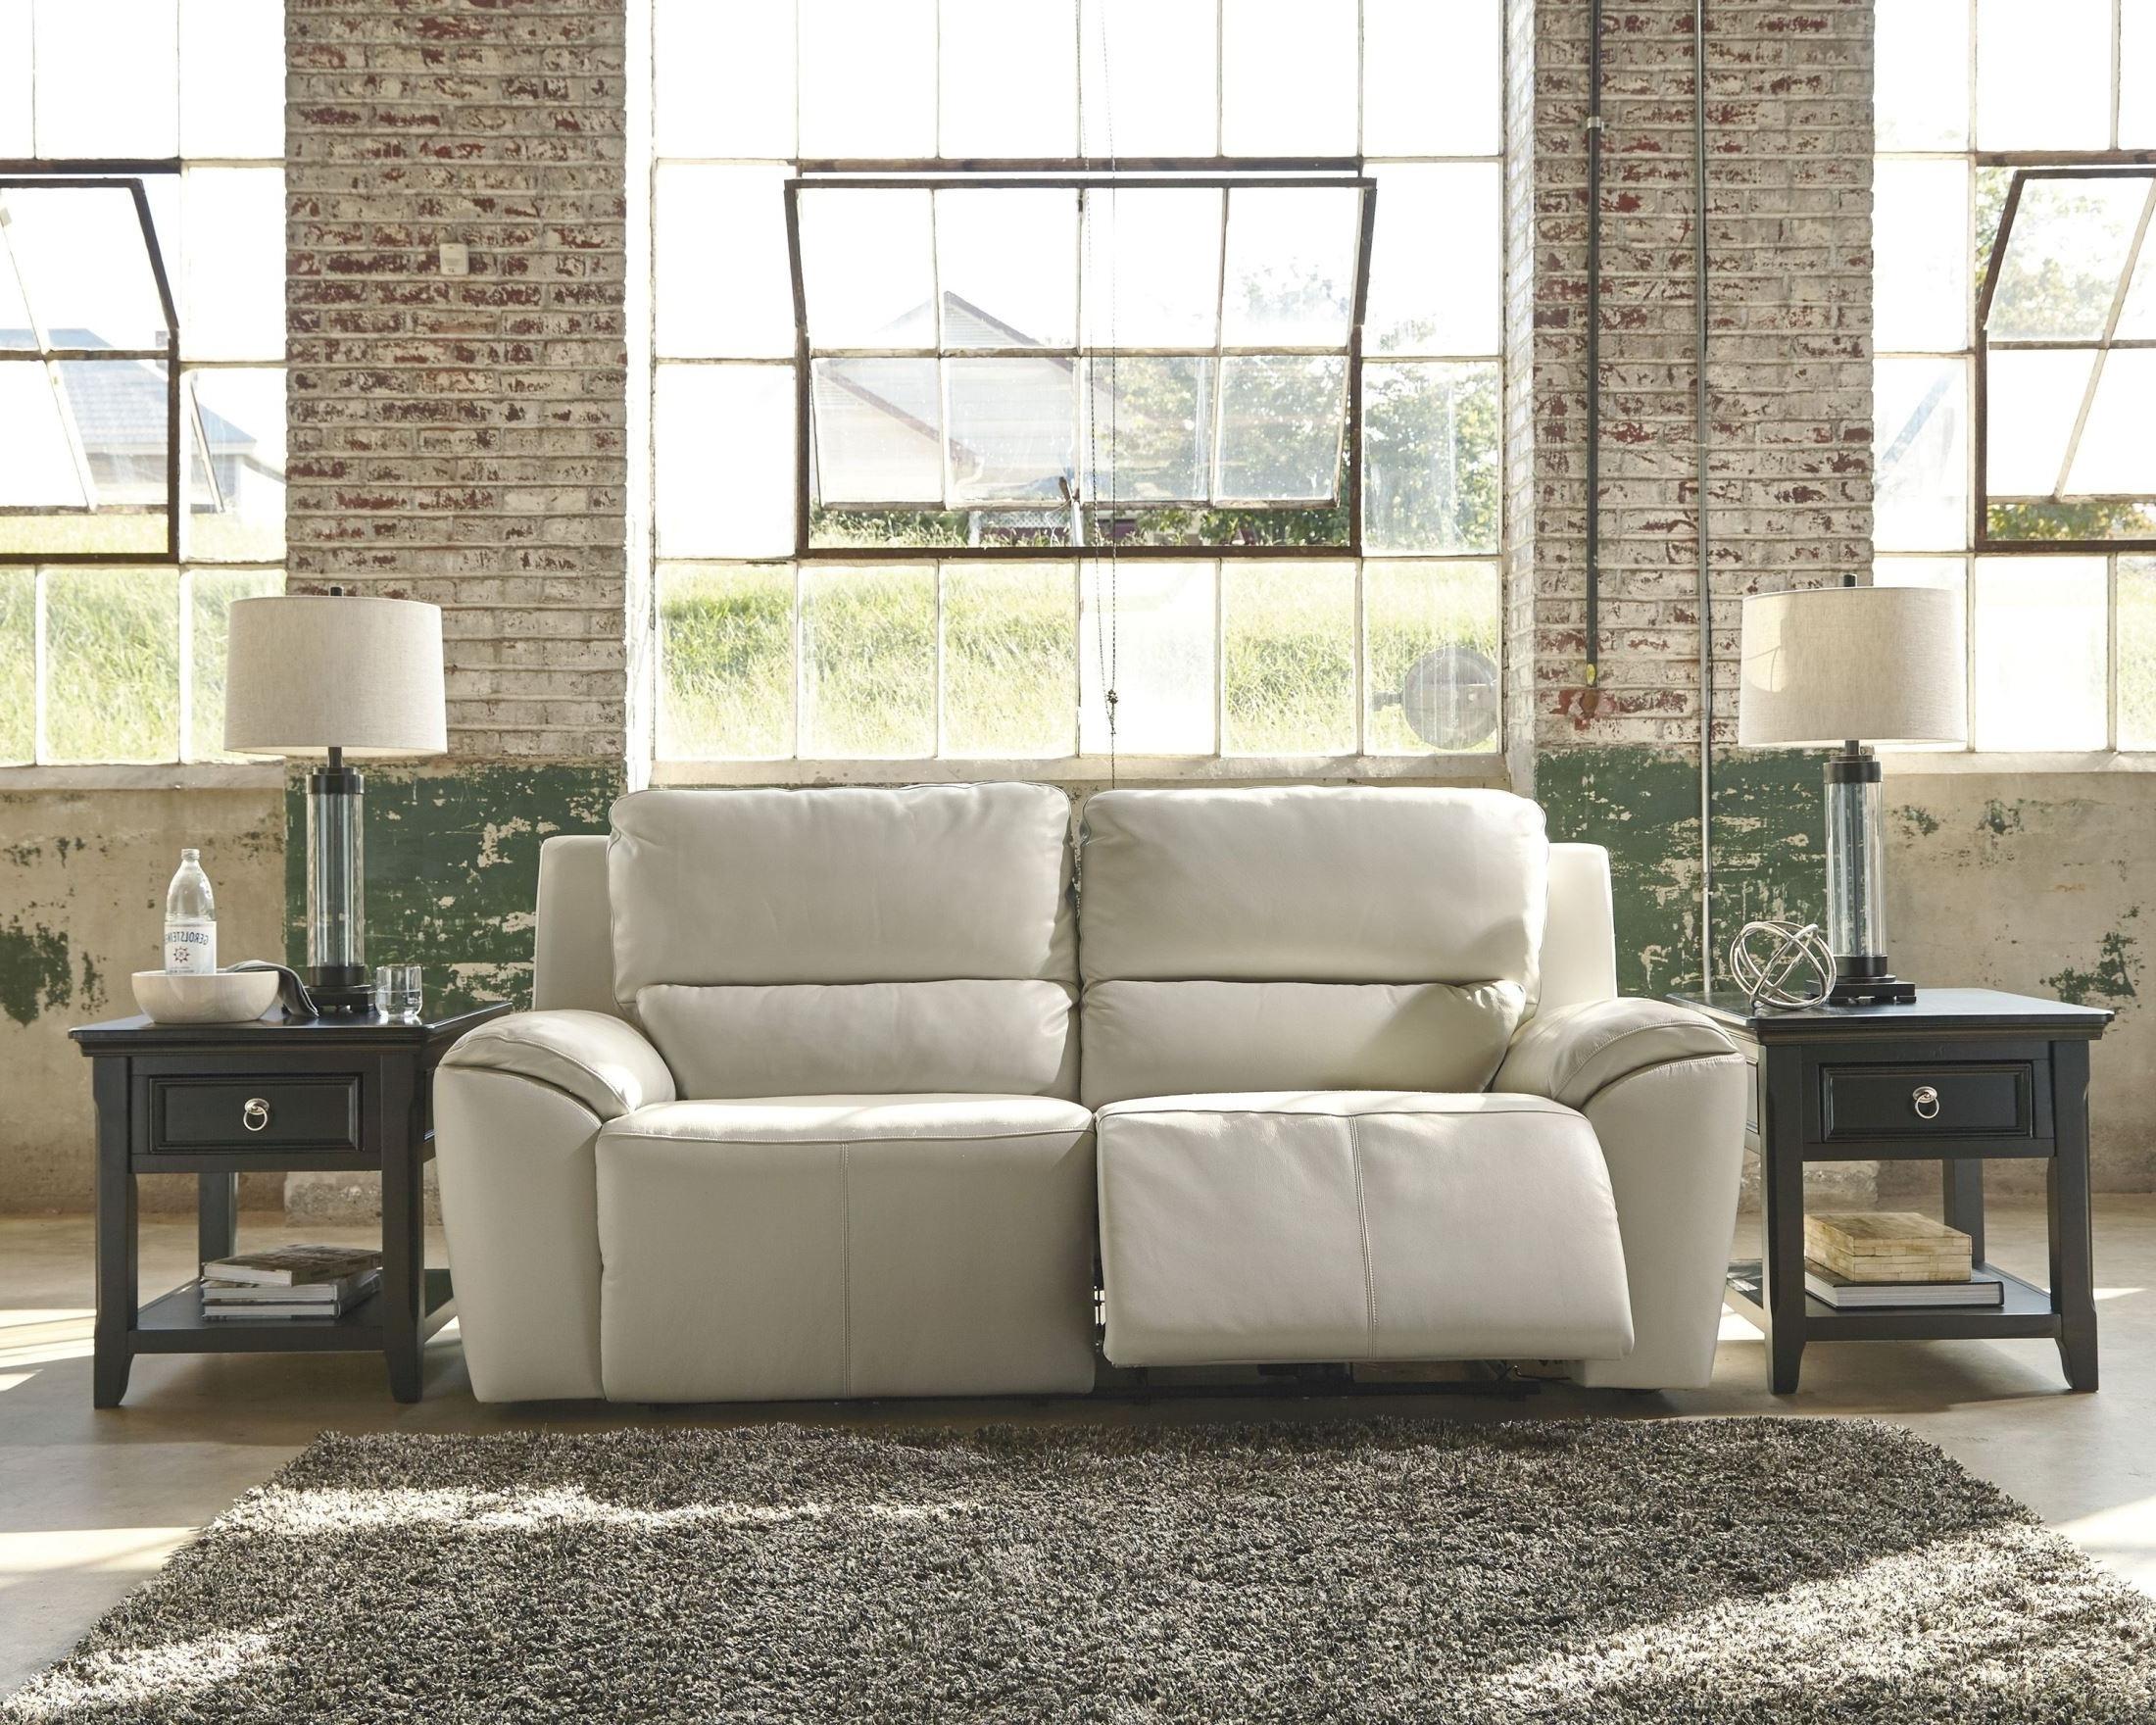 Favorite Valeton Cream 2 Seat Power Reclining Sofa From Ashley (U7350047 Throughout 2 Seat Recliner Sofas (View 14 of 20)